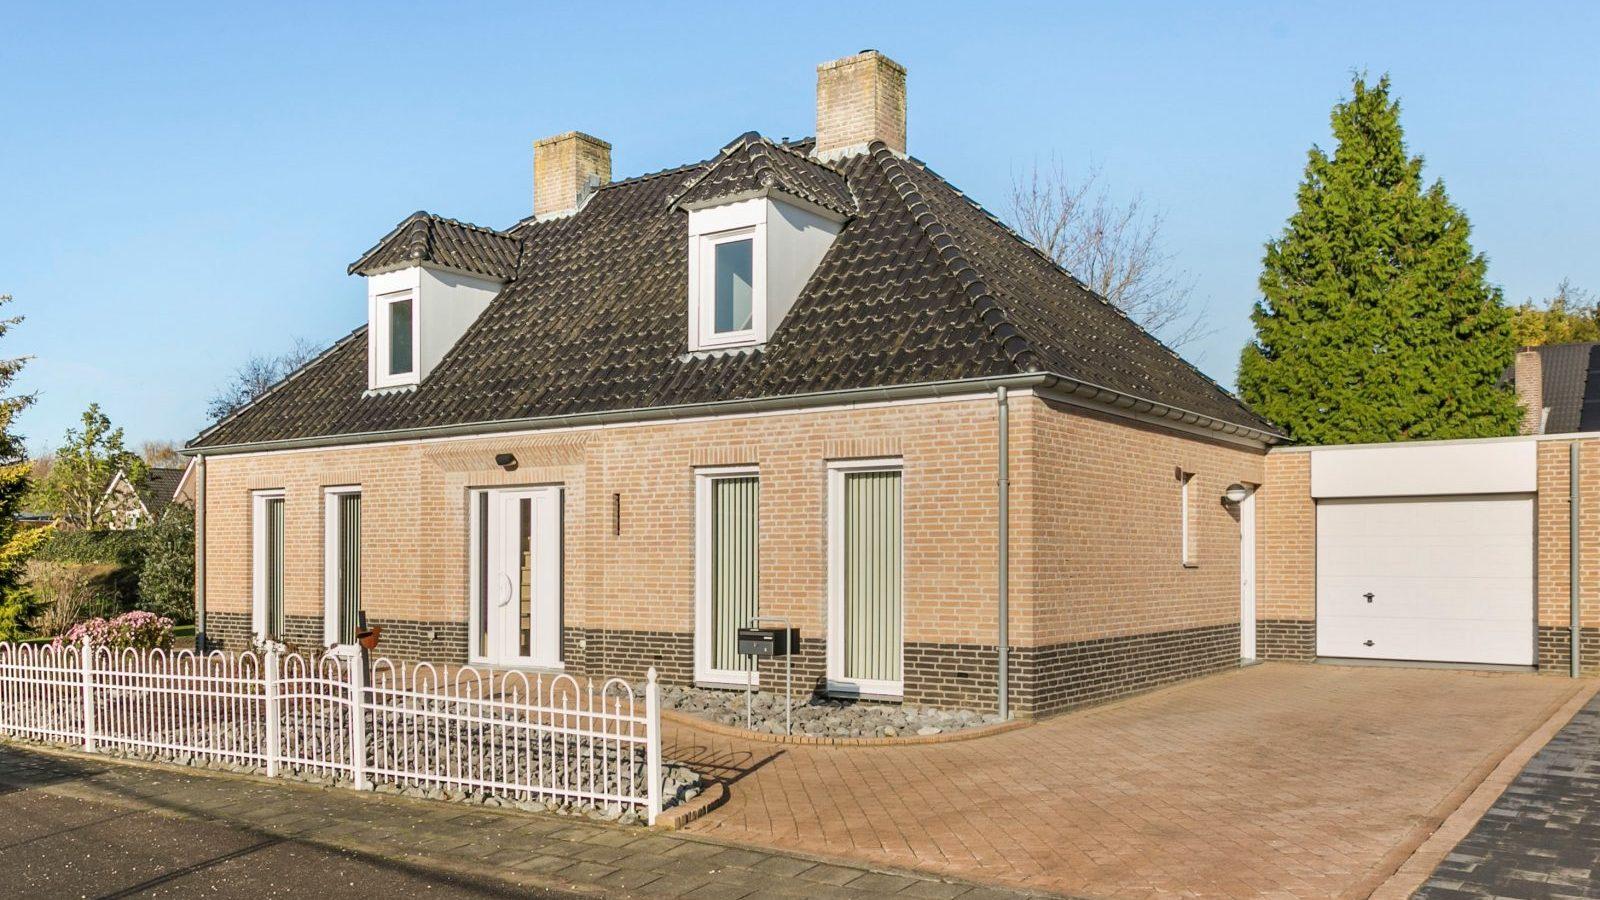 Beeckerhof6Swalmen-06-1-1600x1067